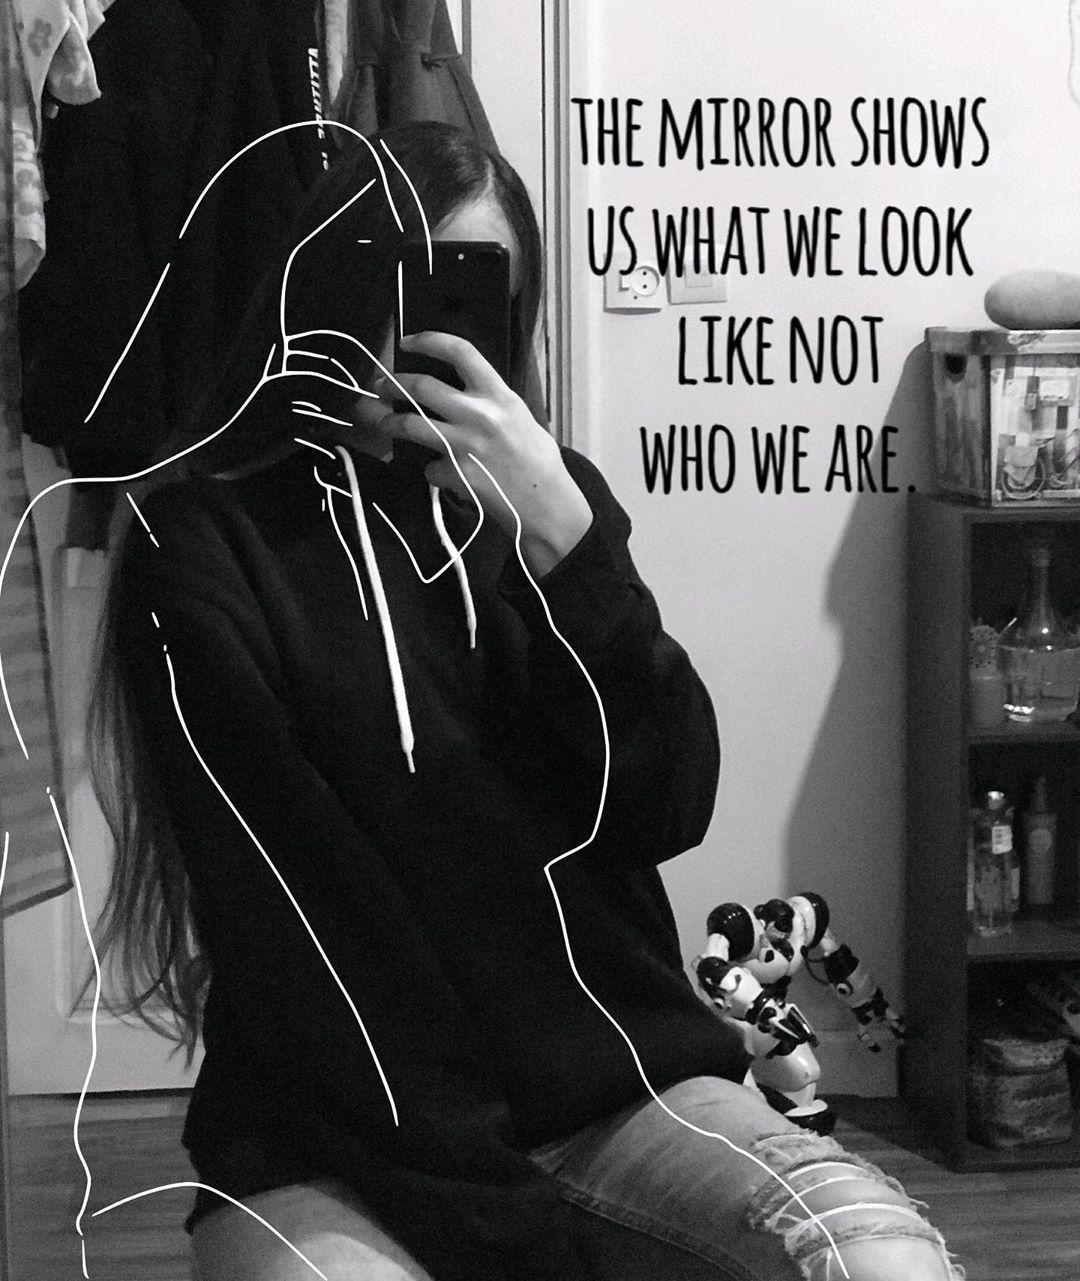 Meryem Abu Akil On Instagram أحب نفسك Quotestoliveby Kira Otakugirl Otakugirl Army Senpai Show Us Shows